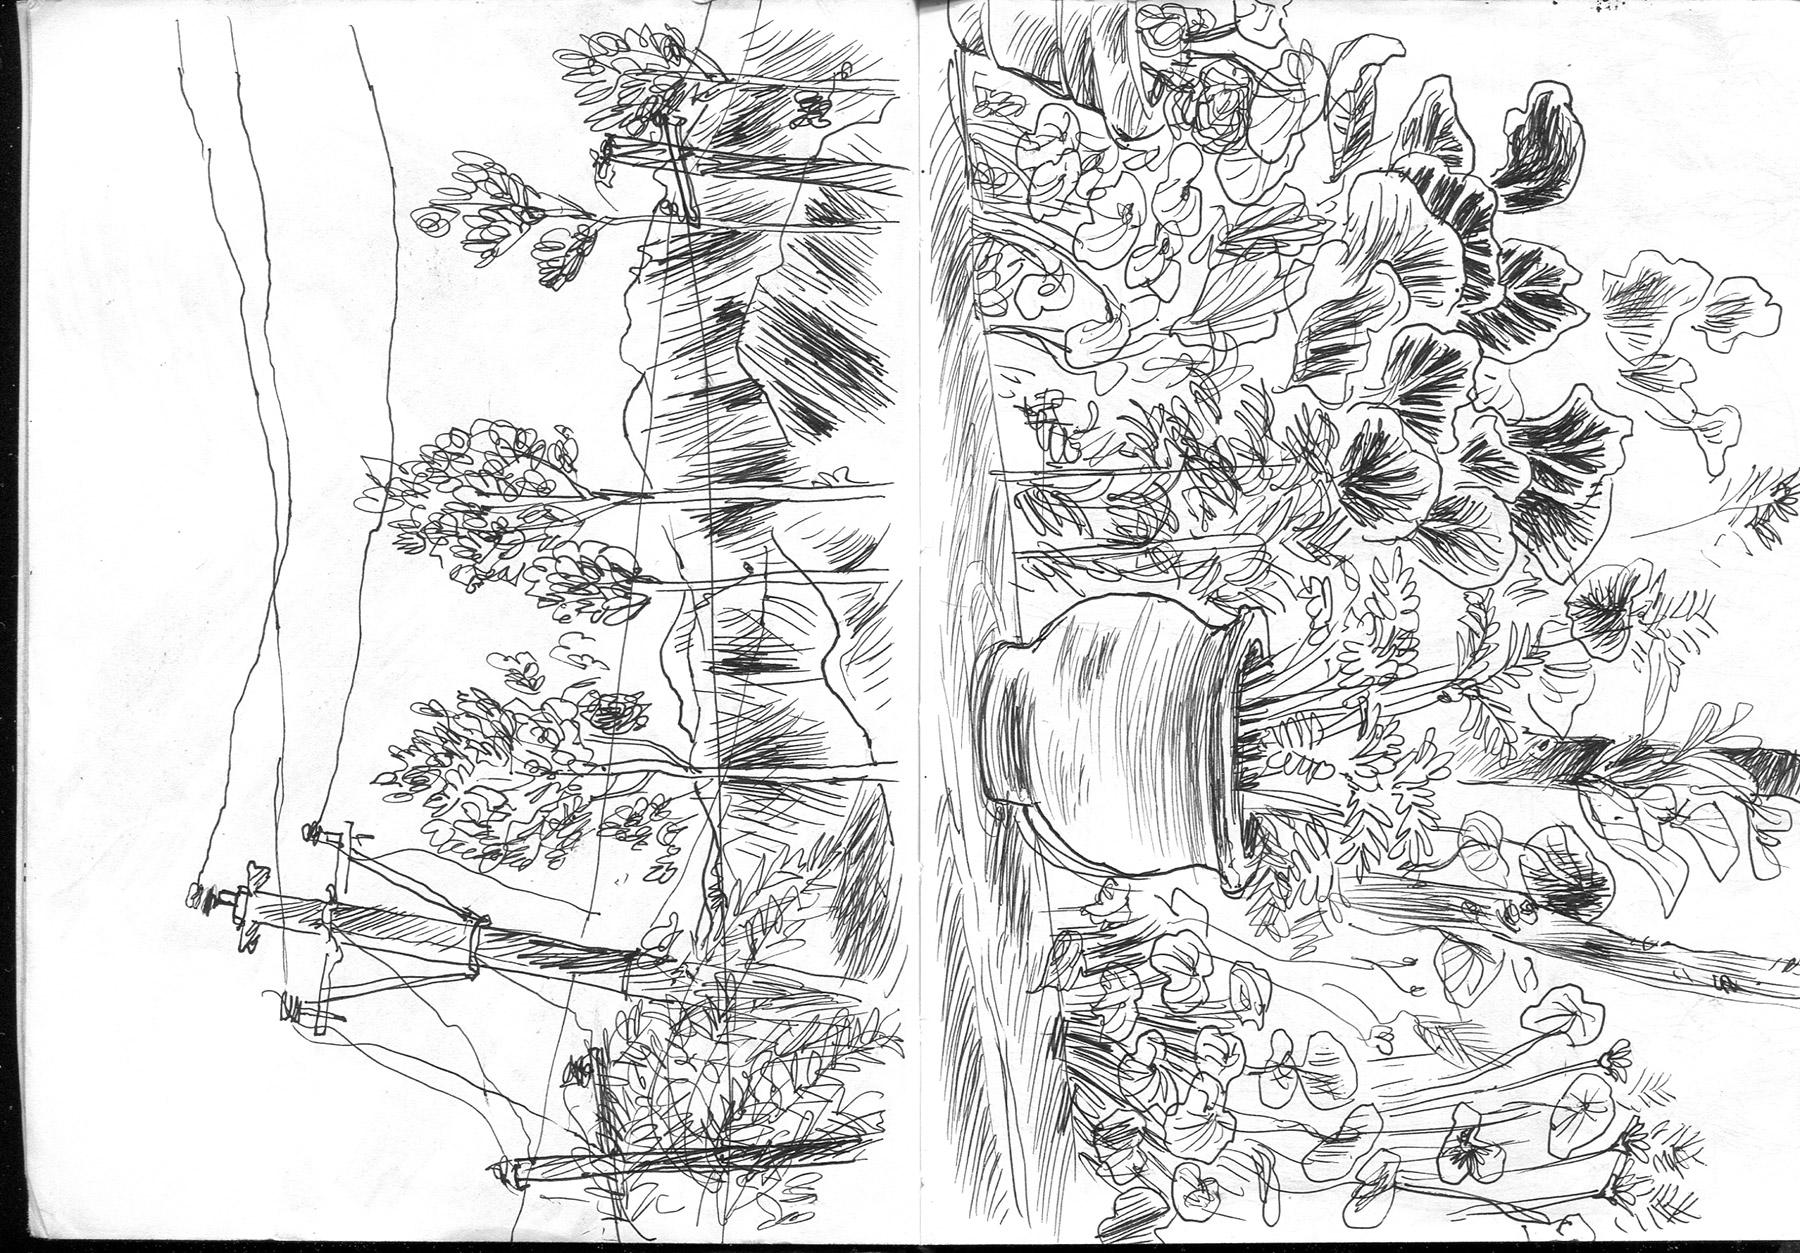 davidm_sketches_2014_08-002.jpg